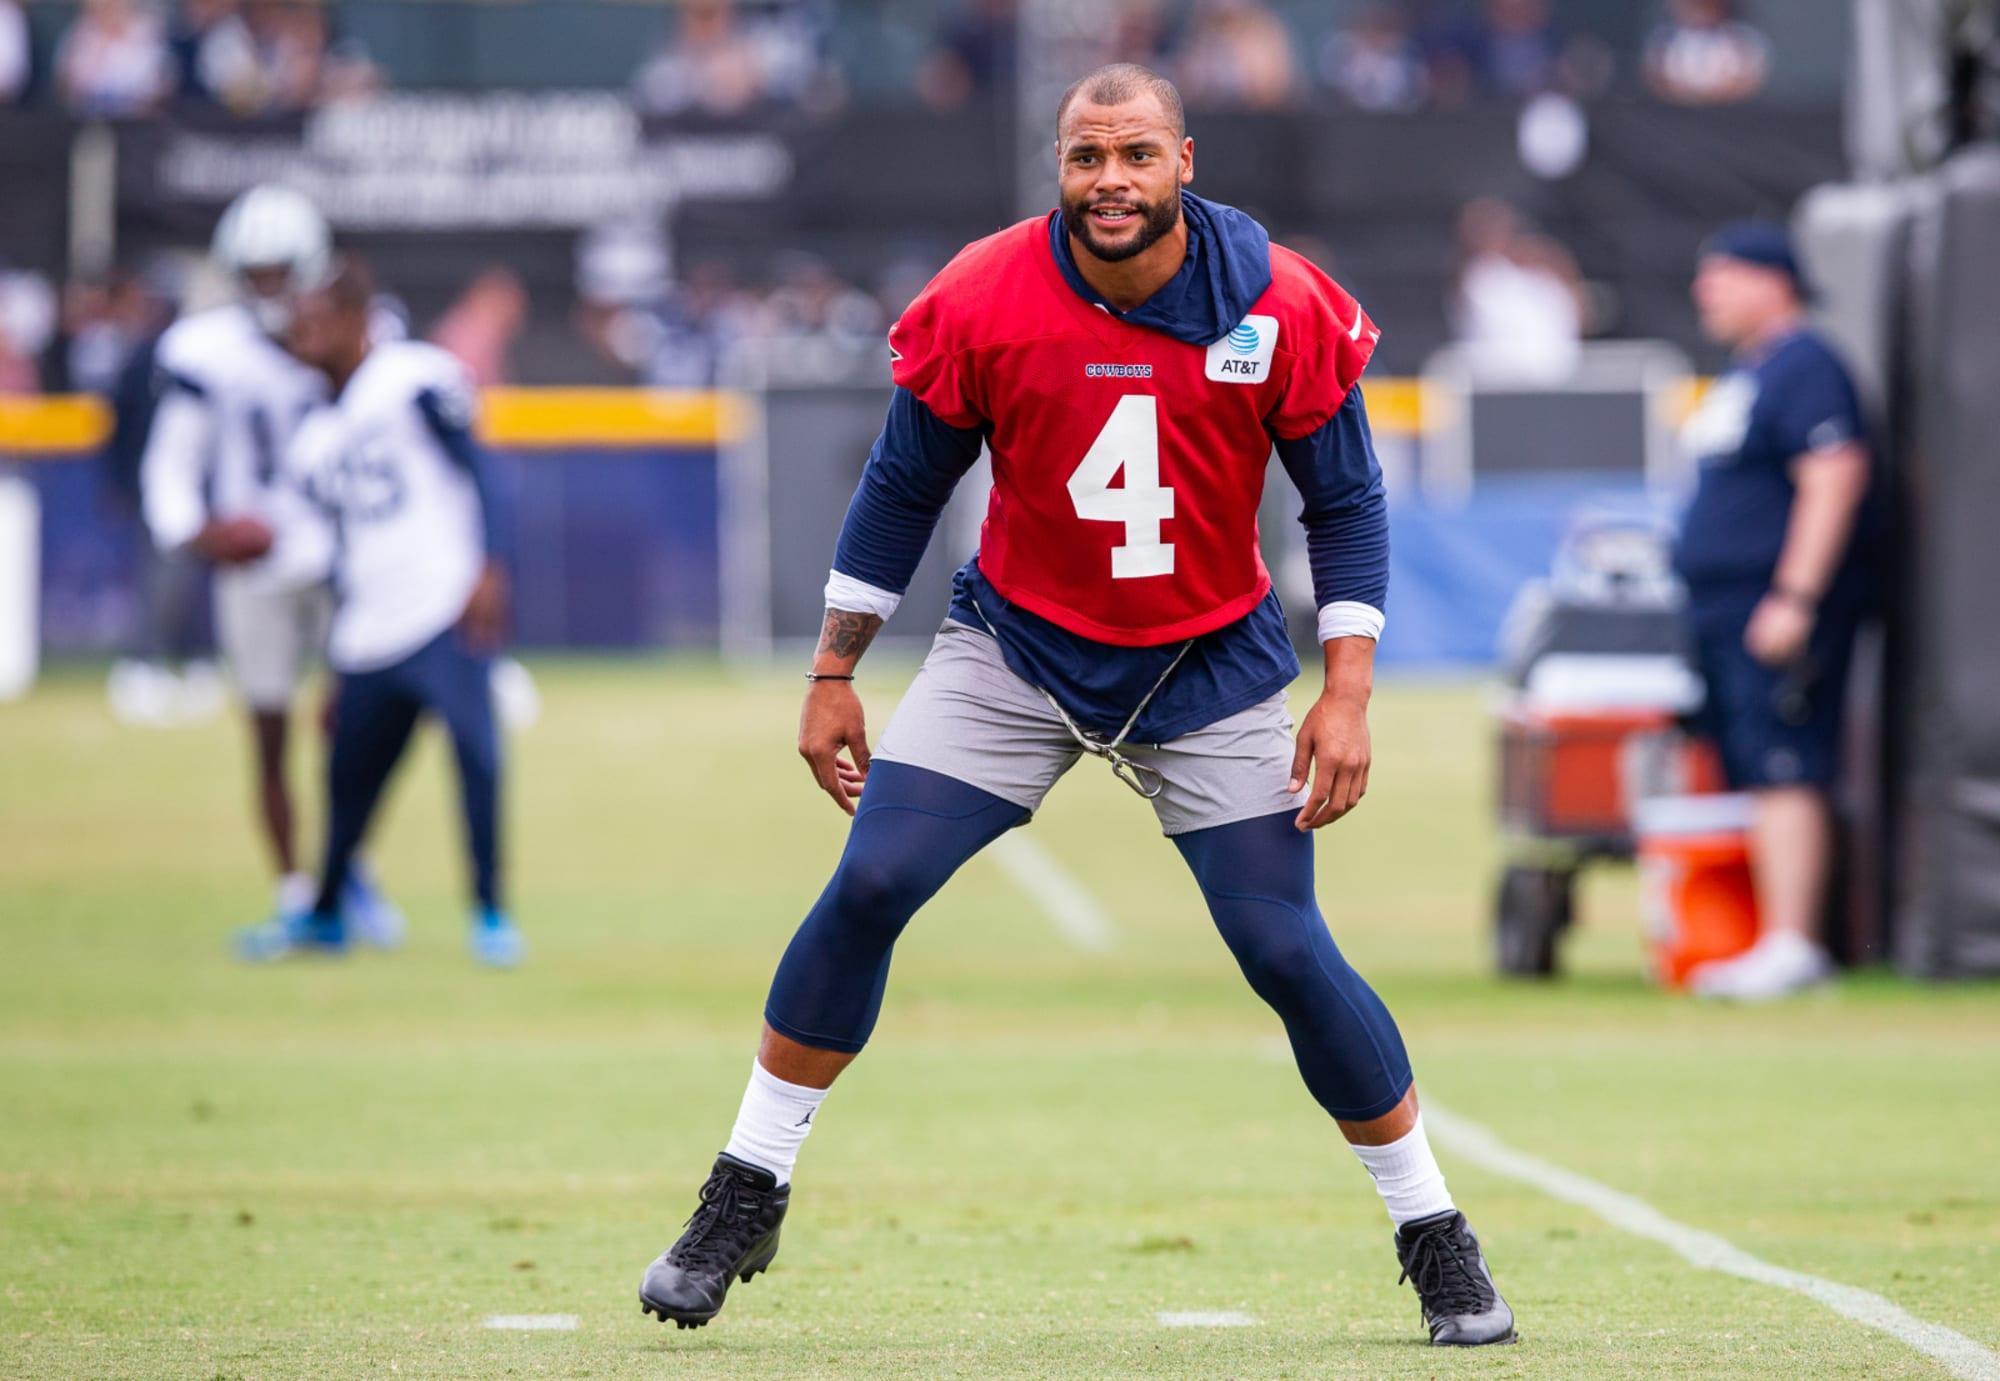 Cowboys reveal concerning 'baseball' injury update on Dak Prescott